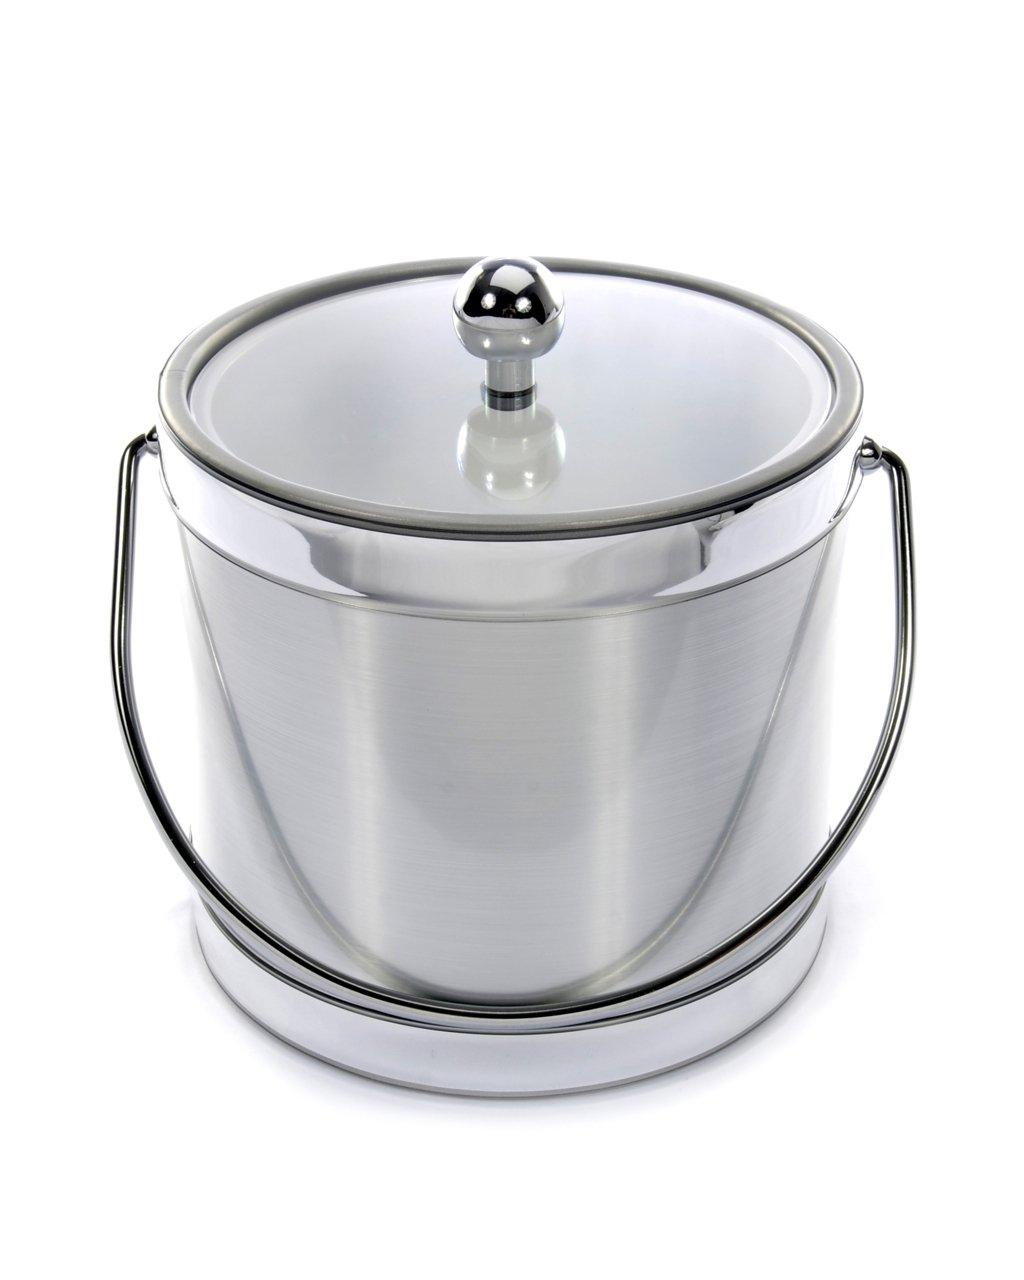 Mr. Ice Bucket 561-1 Brushed Silver Ice Bucket, 3-Quart by Mr. Ice Bucket